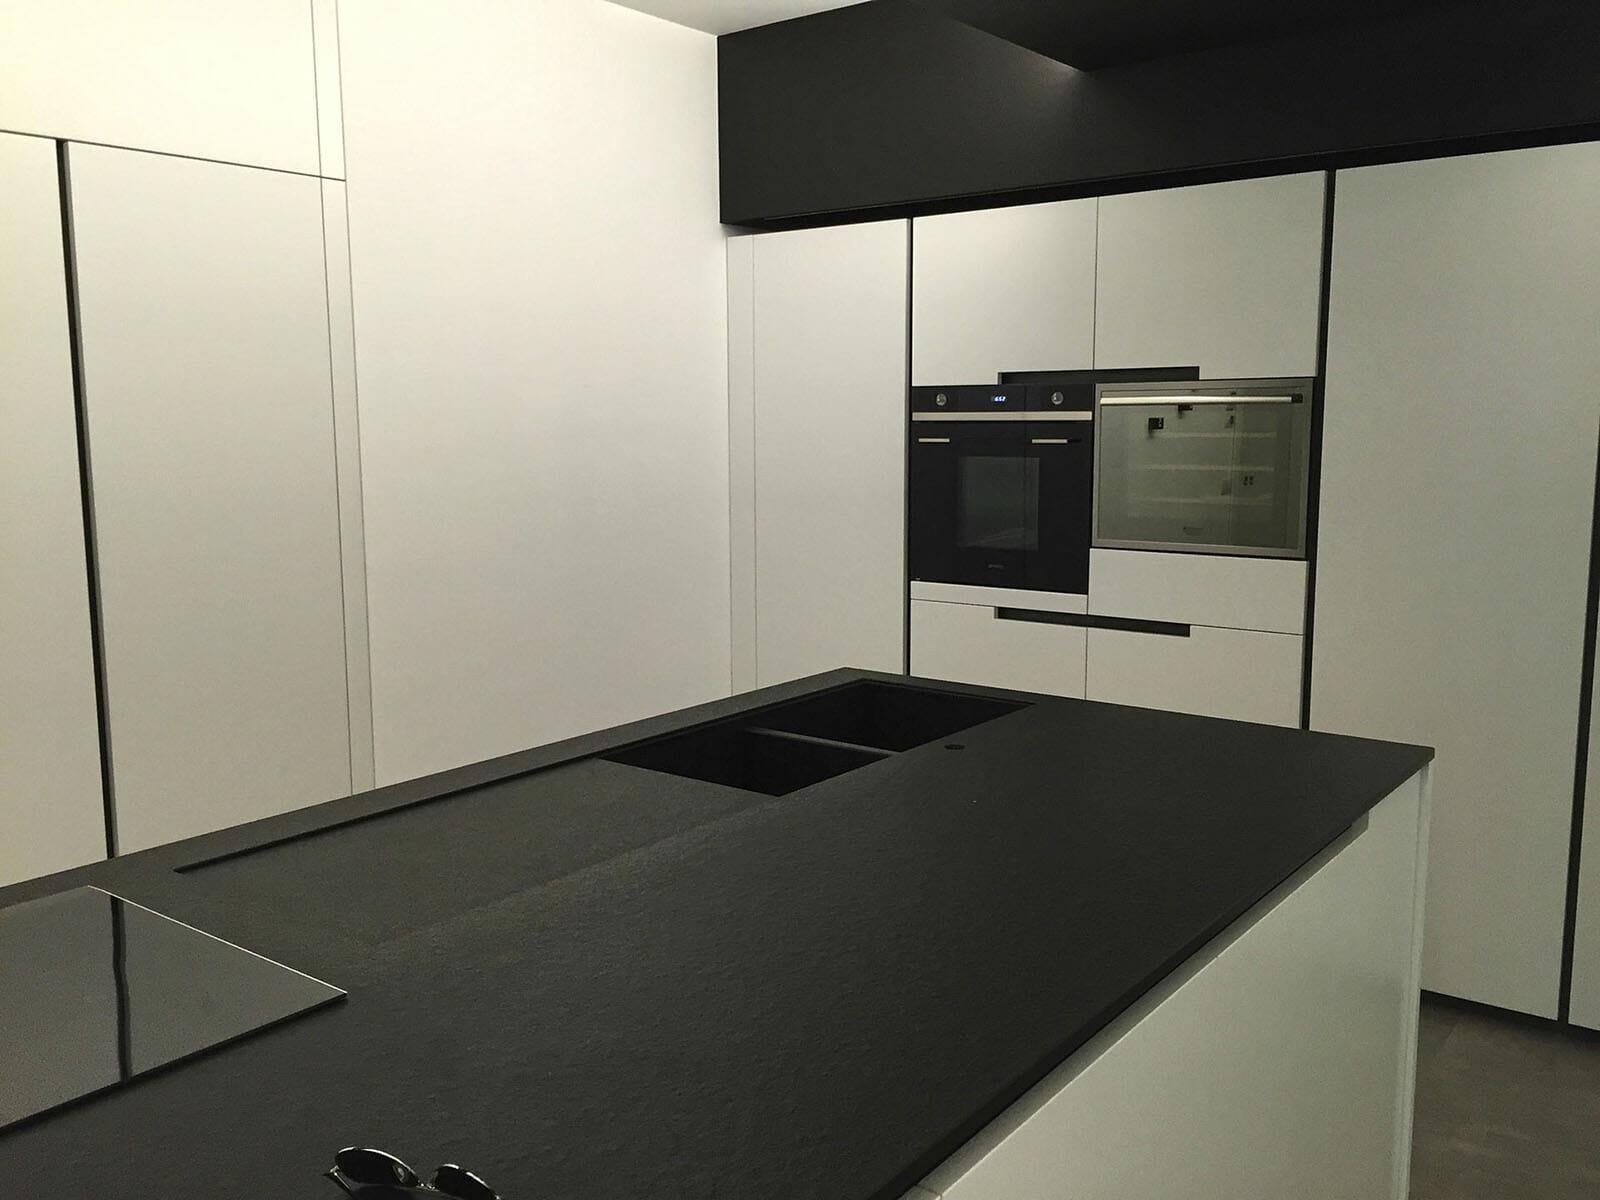 Piano Cucina in Marmo-2